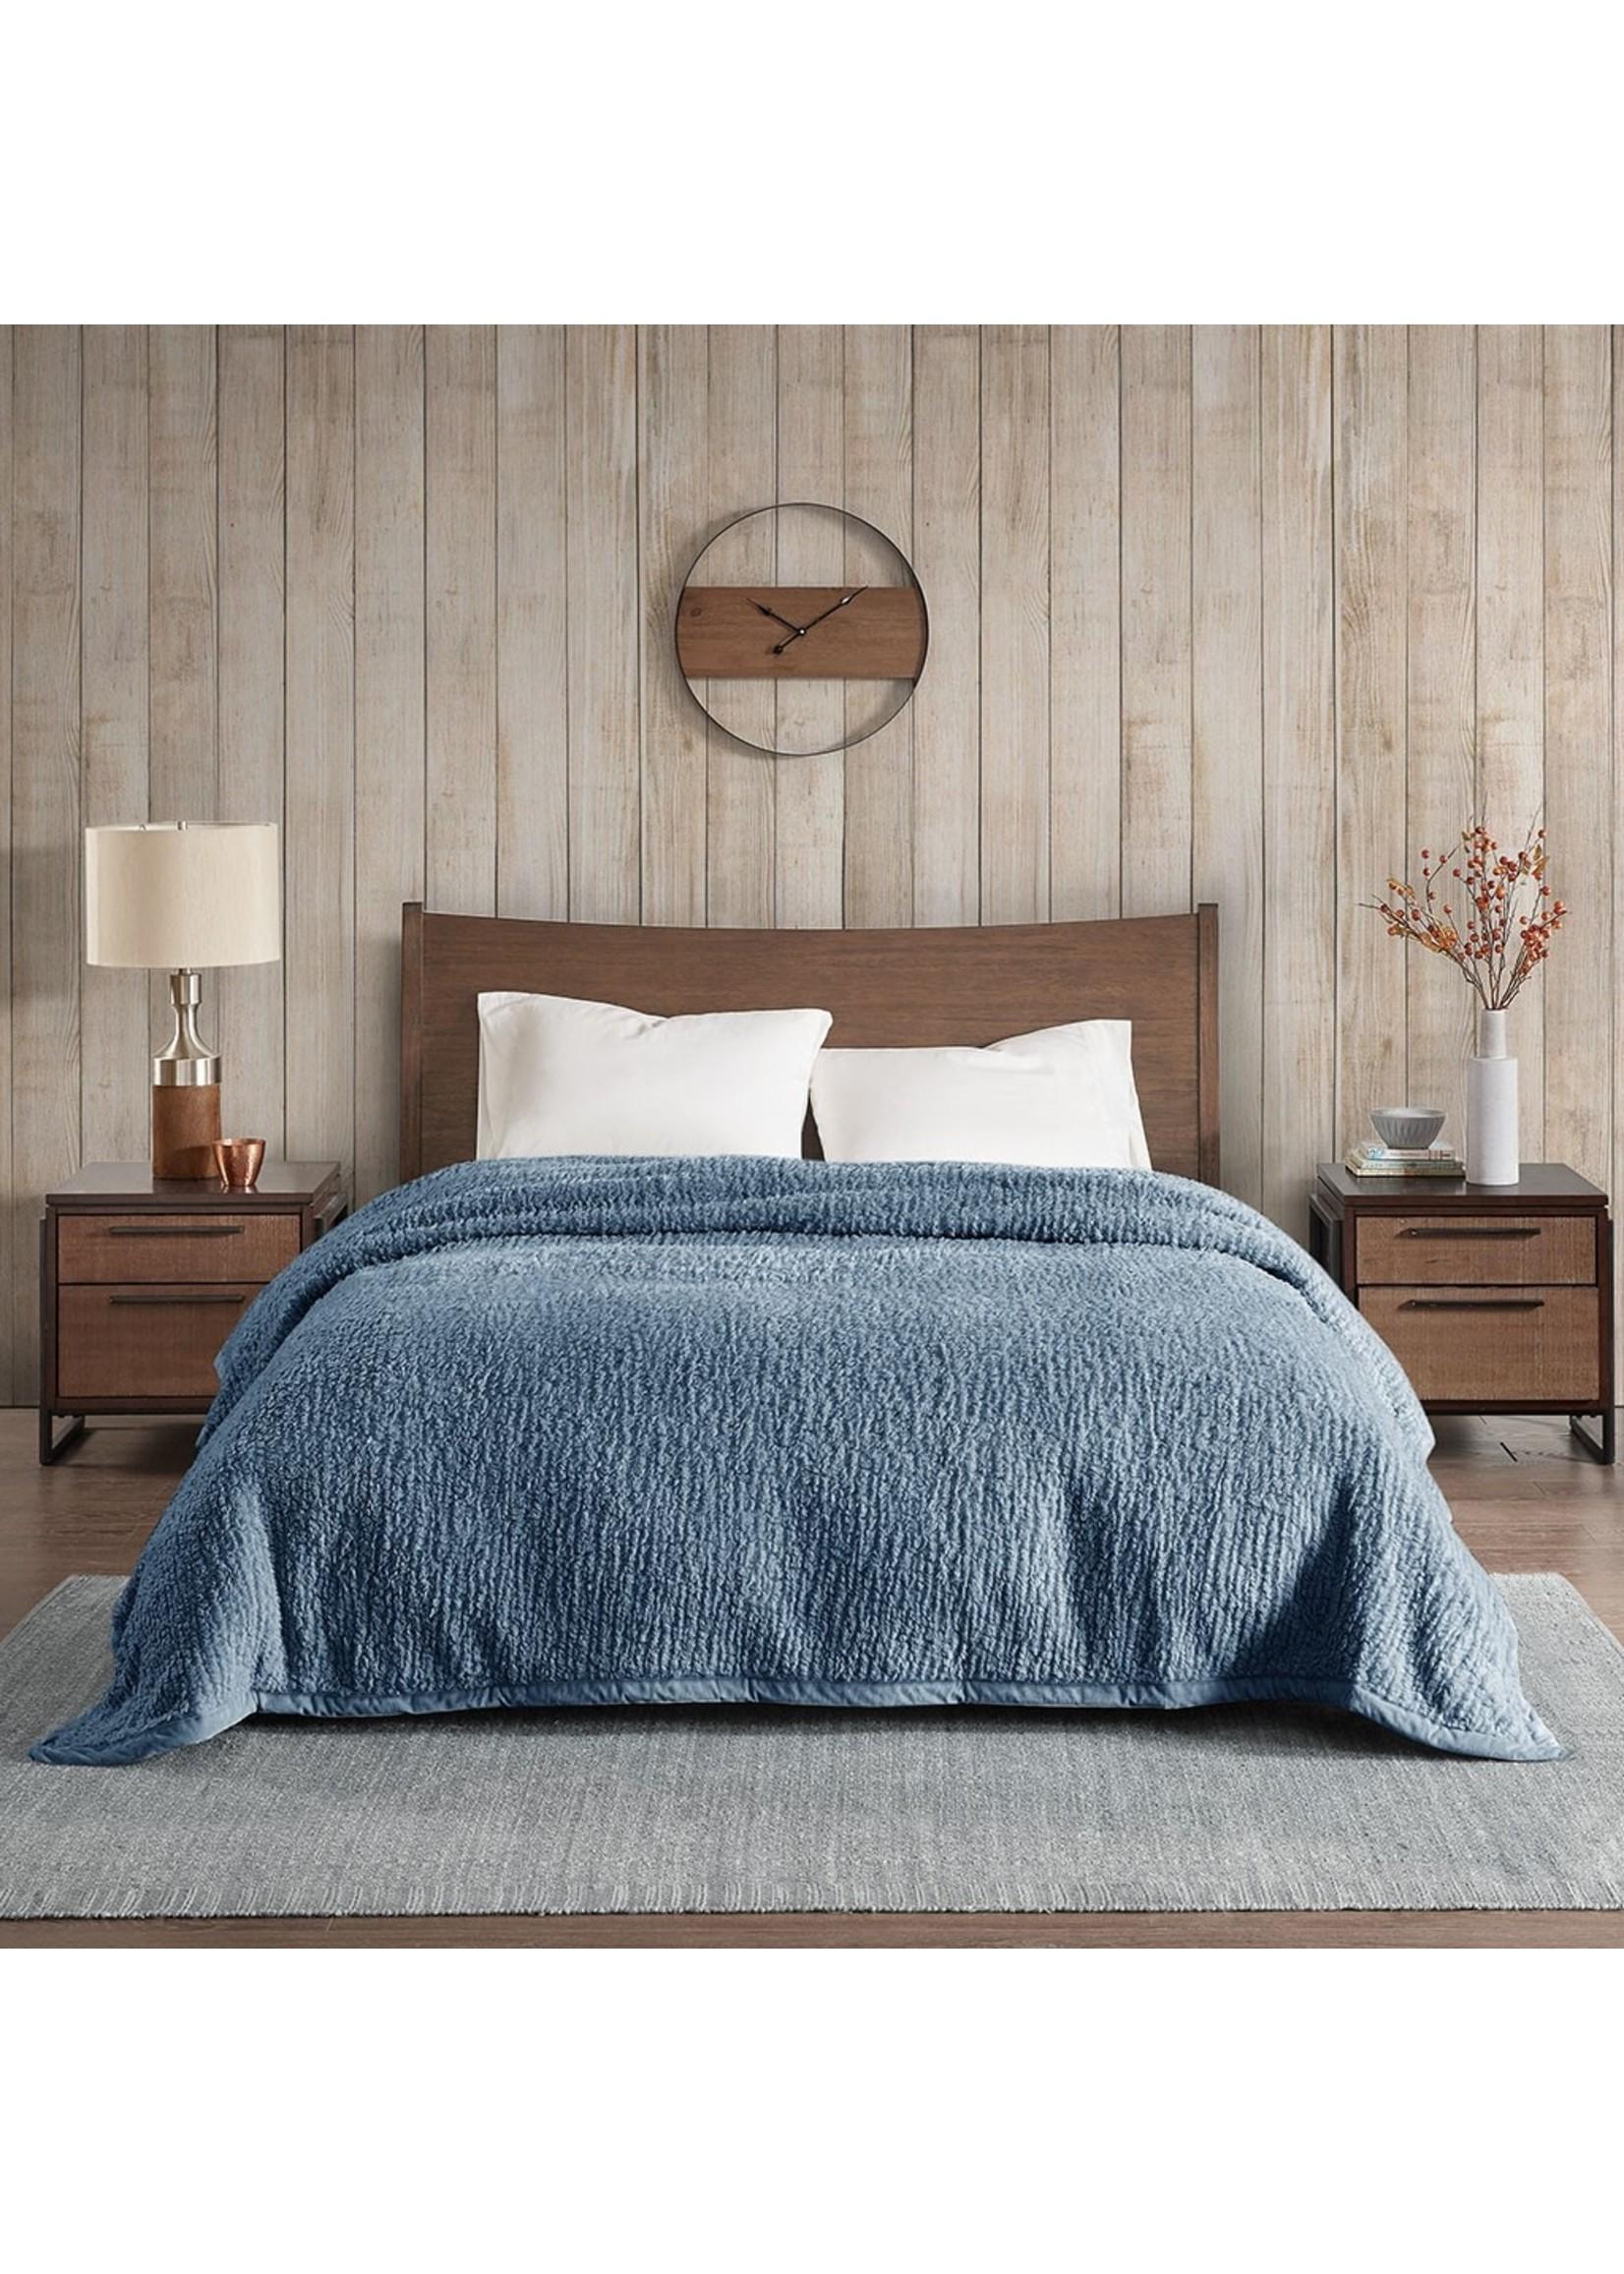 Olliix Blue Sherpa Blanket - Full/Queen